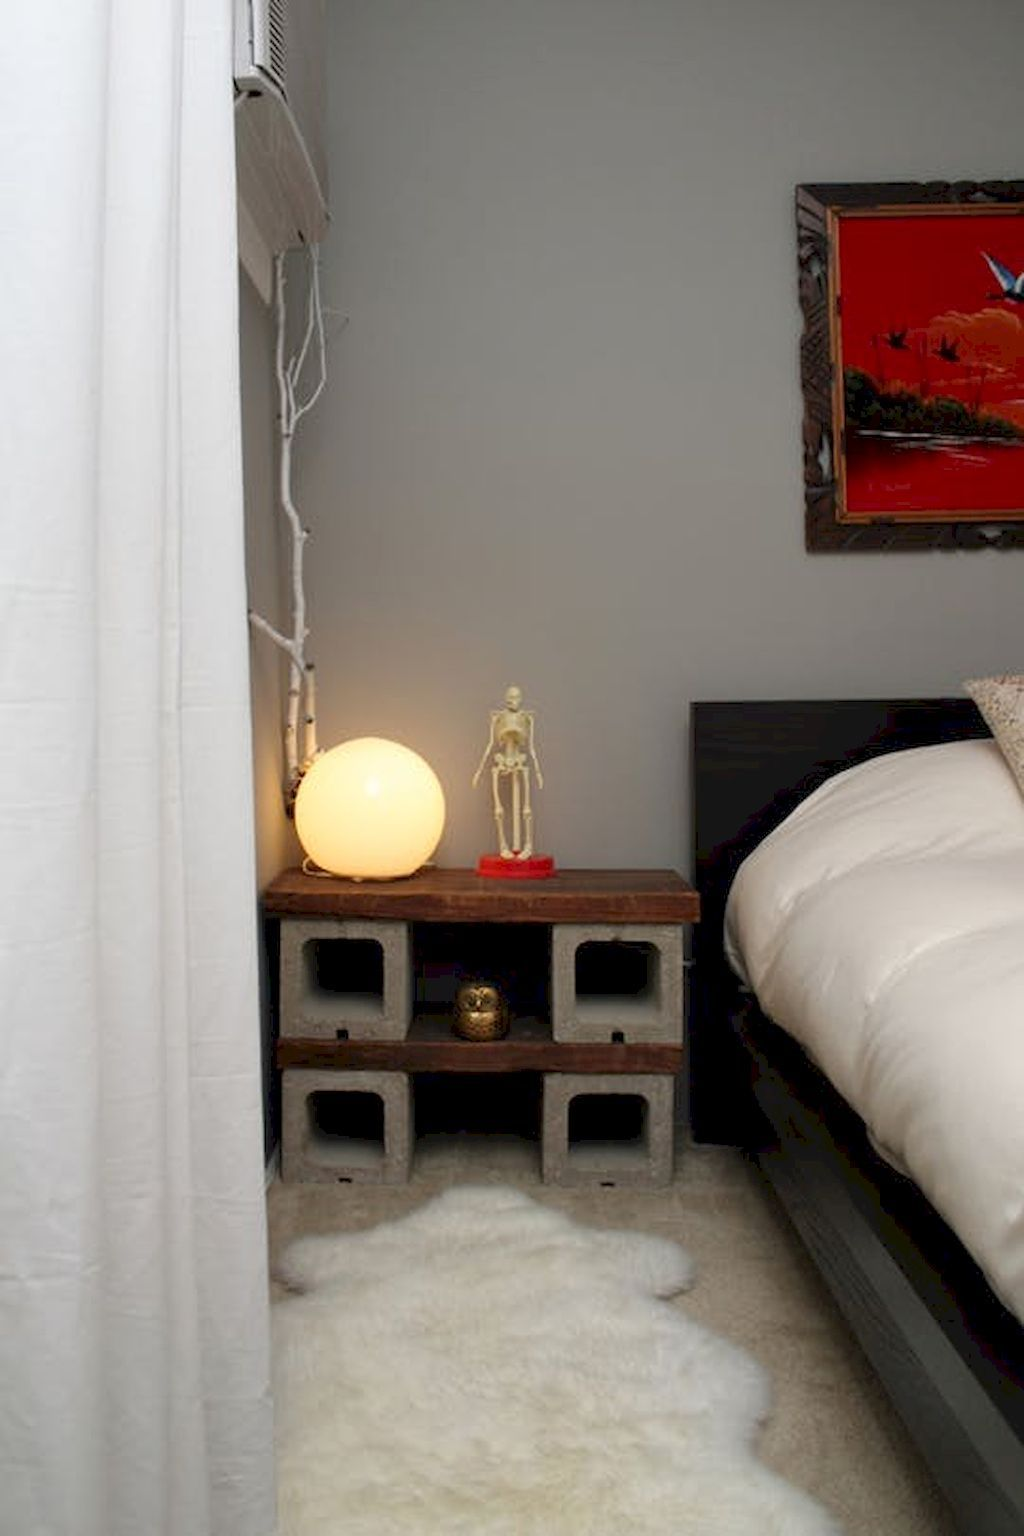 cinderblock furniture. Nice 75 Creative DIY Cinder Block Furniture And Decor Ideas Https://decorapartment.com/75-creative-diy-cinder-block-furniture -decor-ideas/ Cinderblock